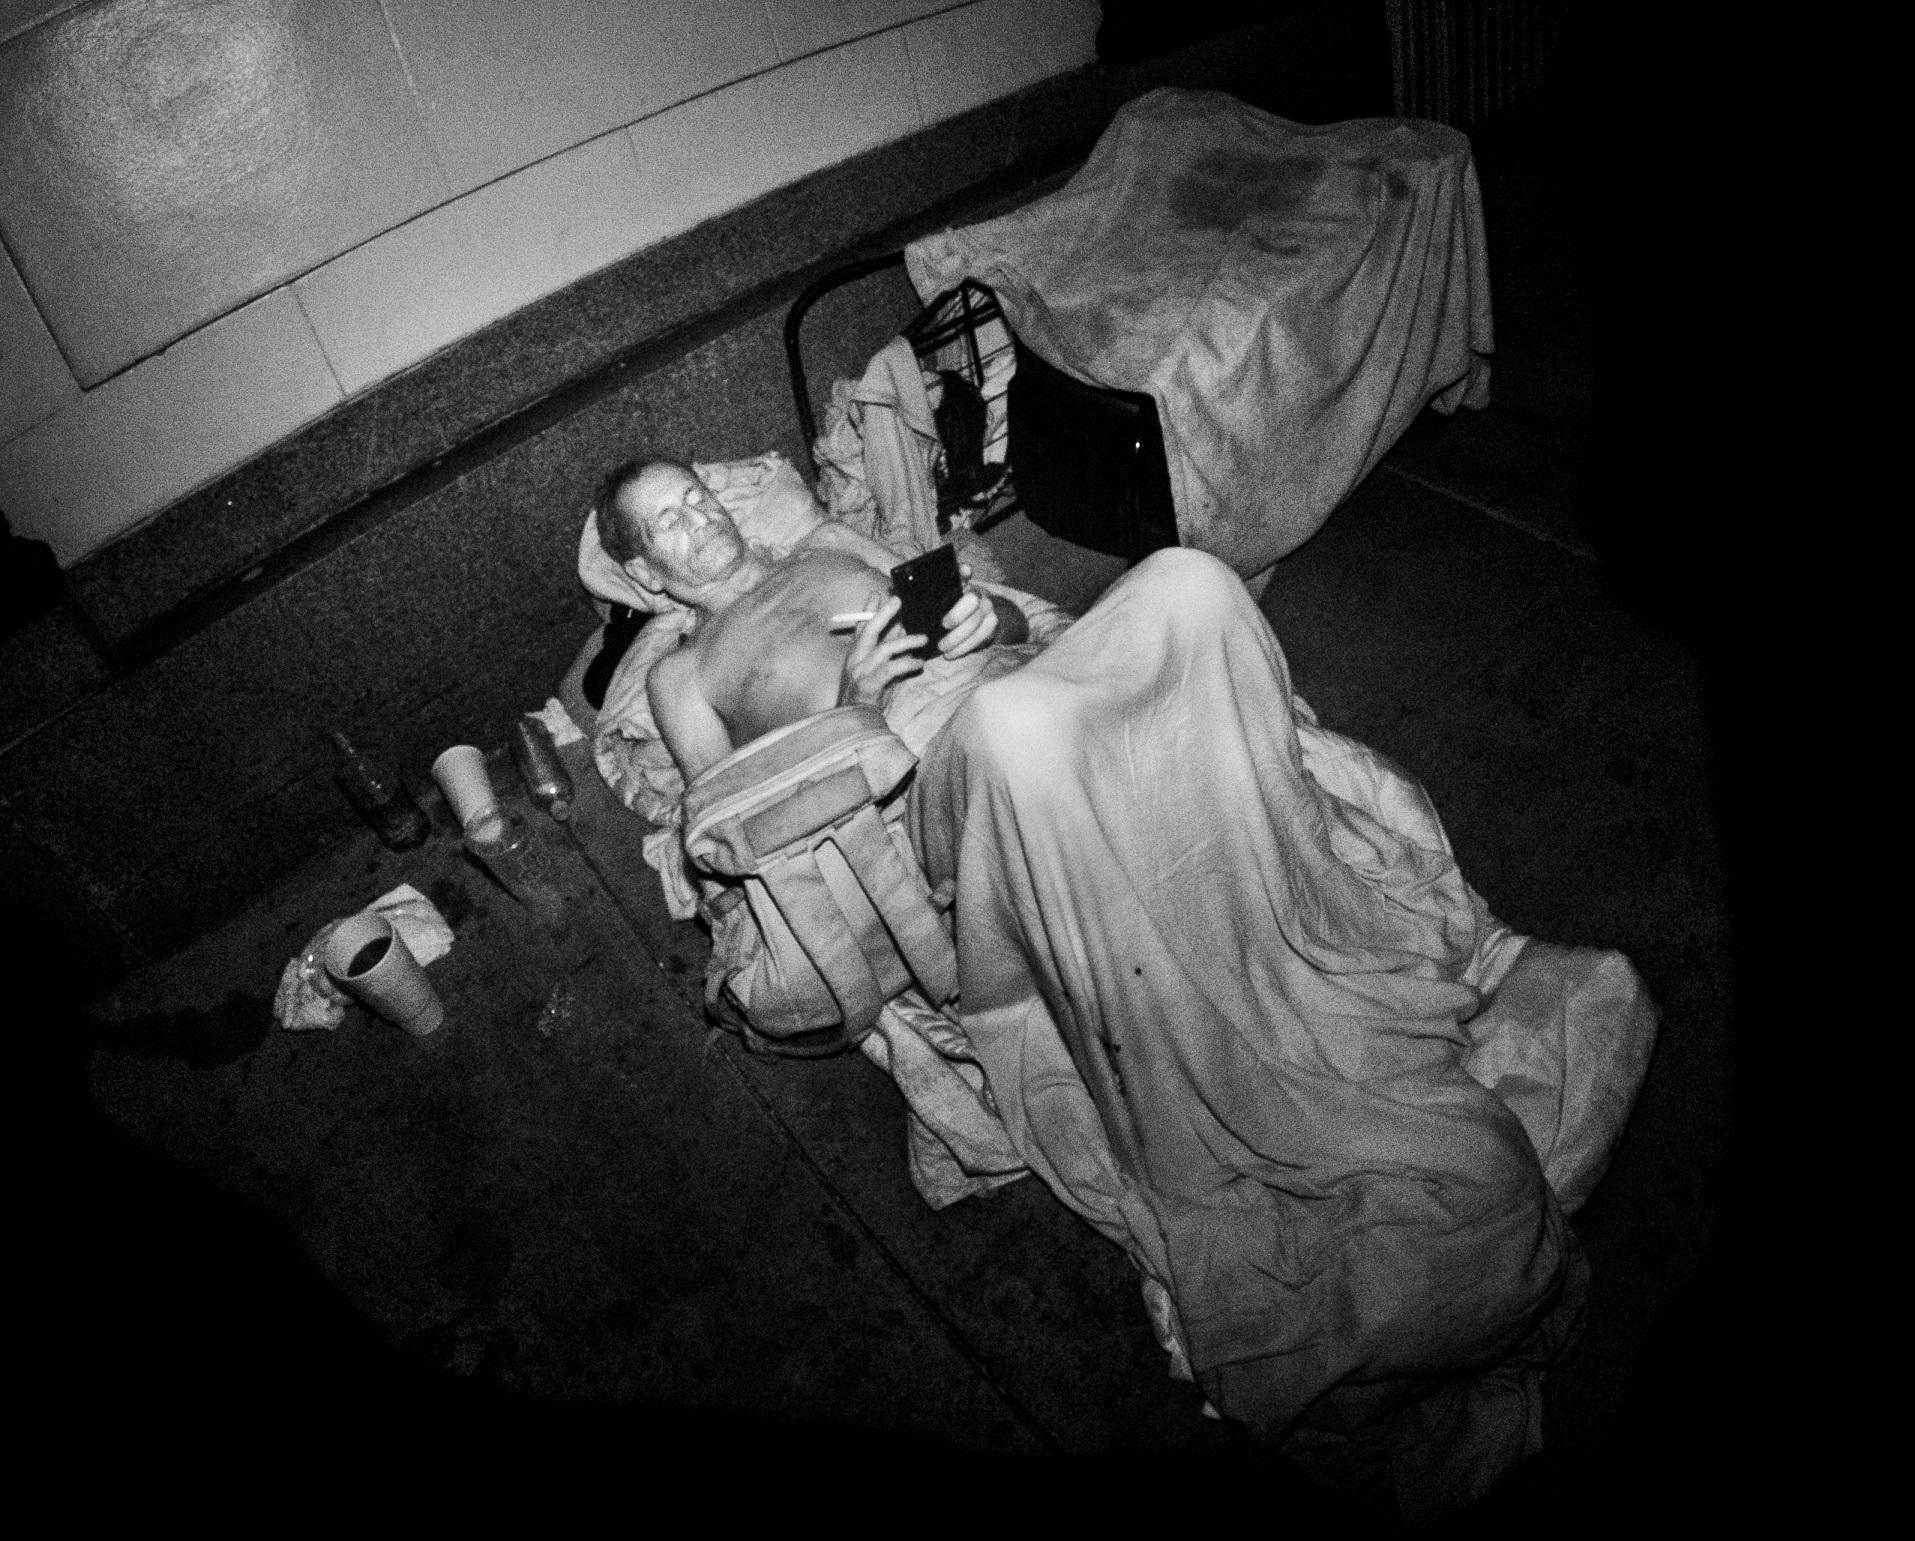 homeless-man-with-cell-phone-infrared-flash-hollywood-ca-2015-daniel-d-teoli-lr.jpg